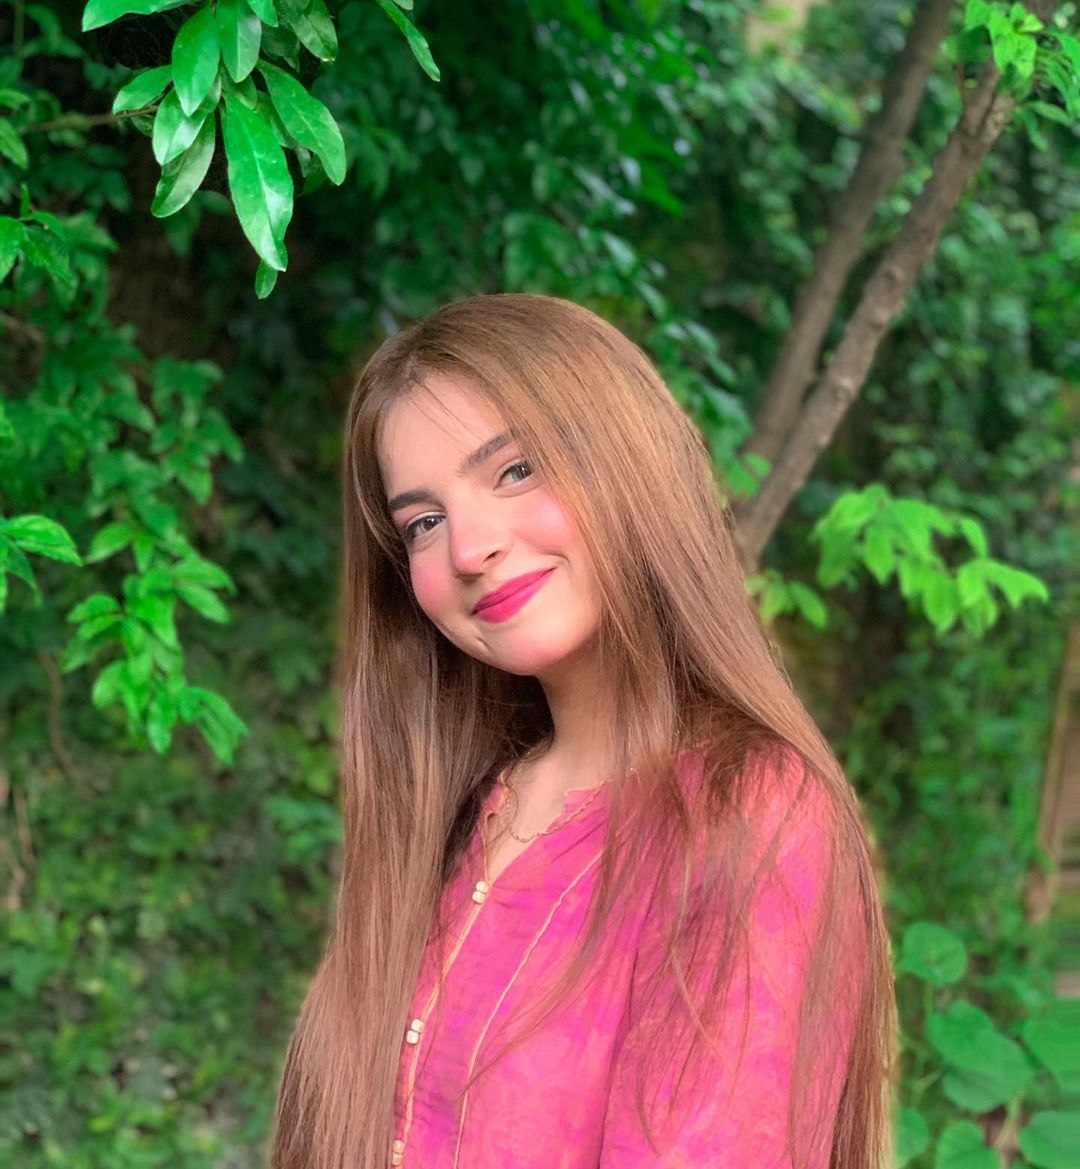 Pawri Ho Rahi Hai Girl Dananeer Mobeen PC Desktop Wallpaper